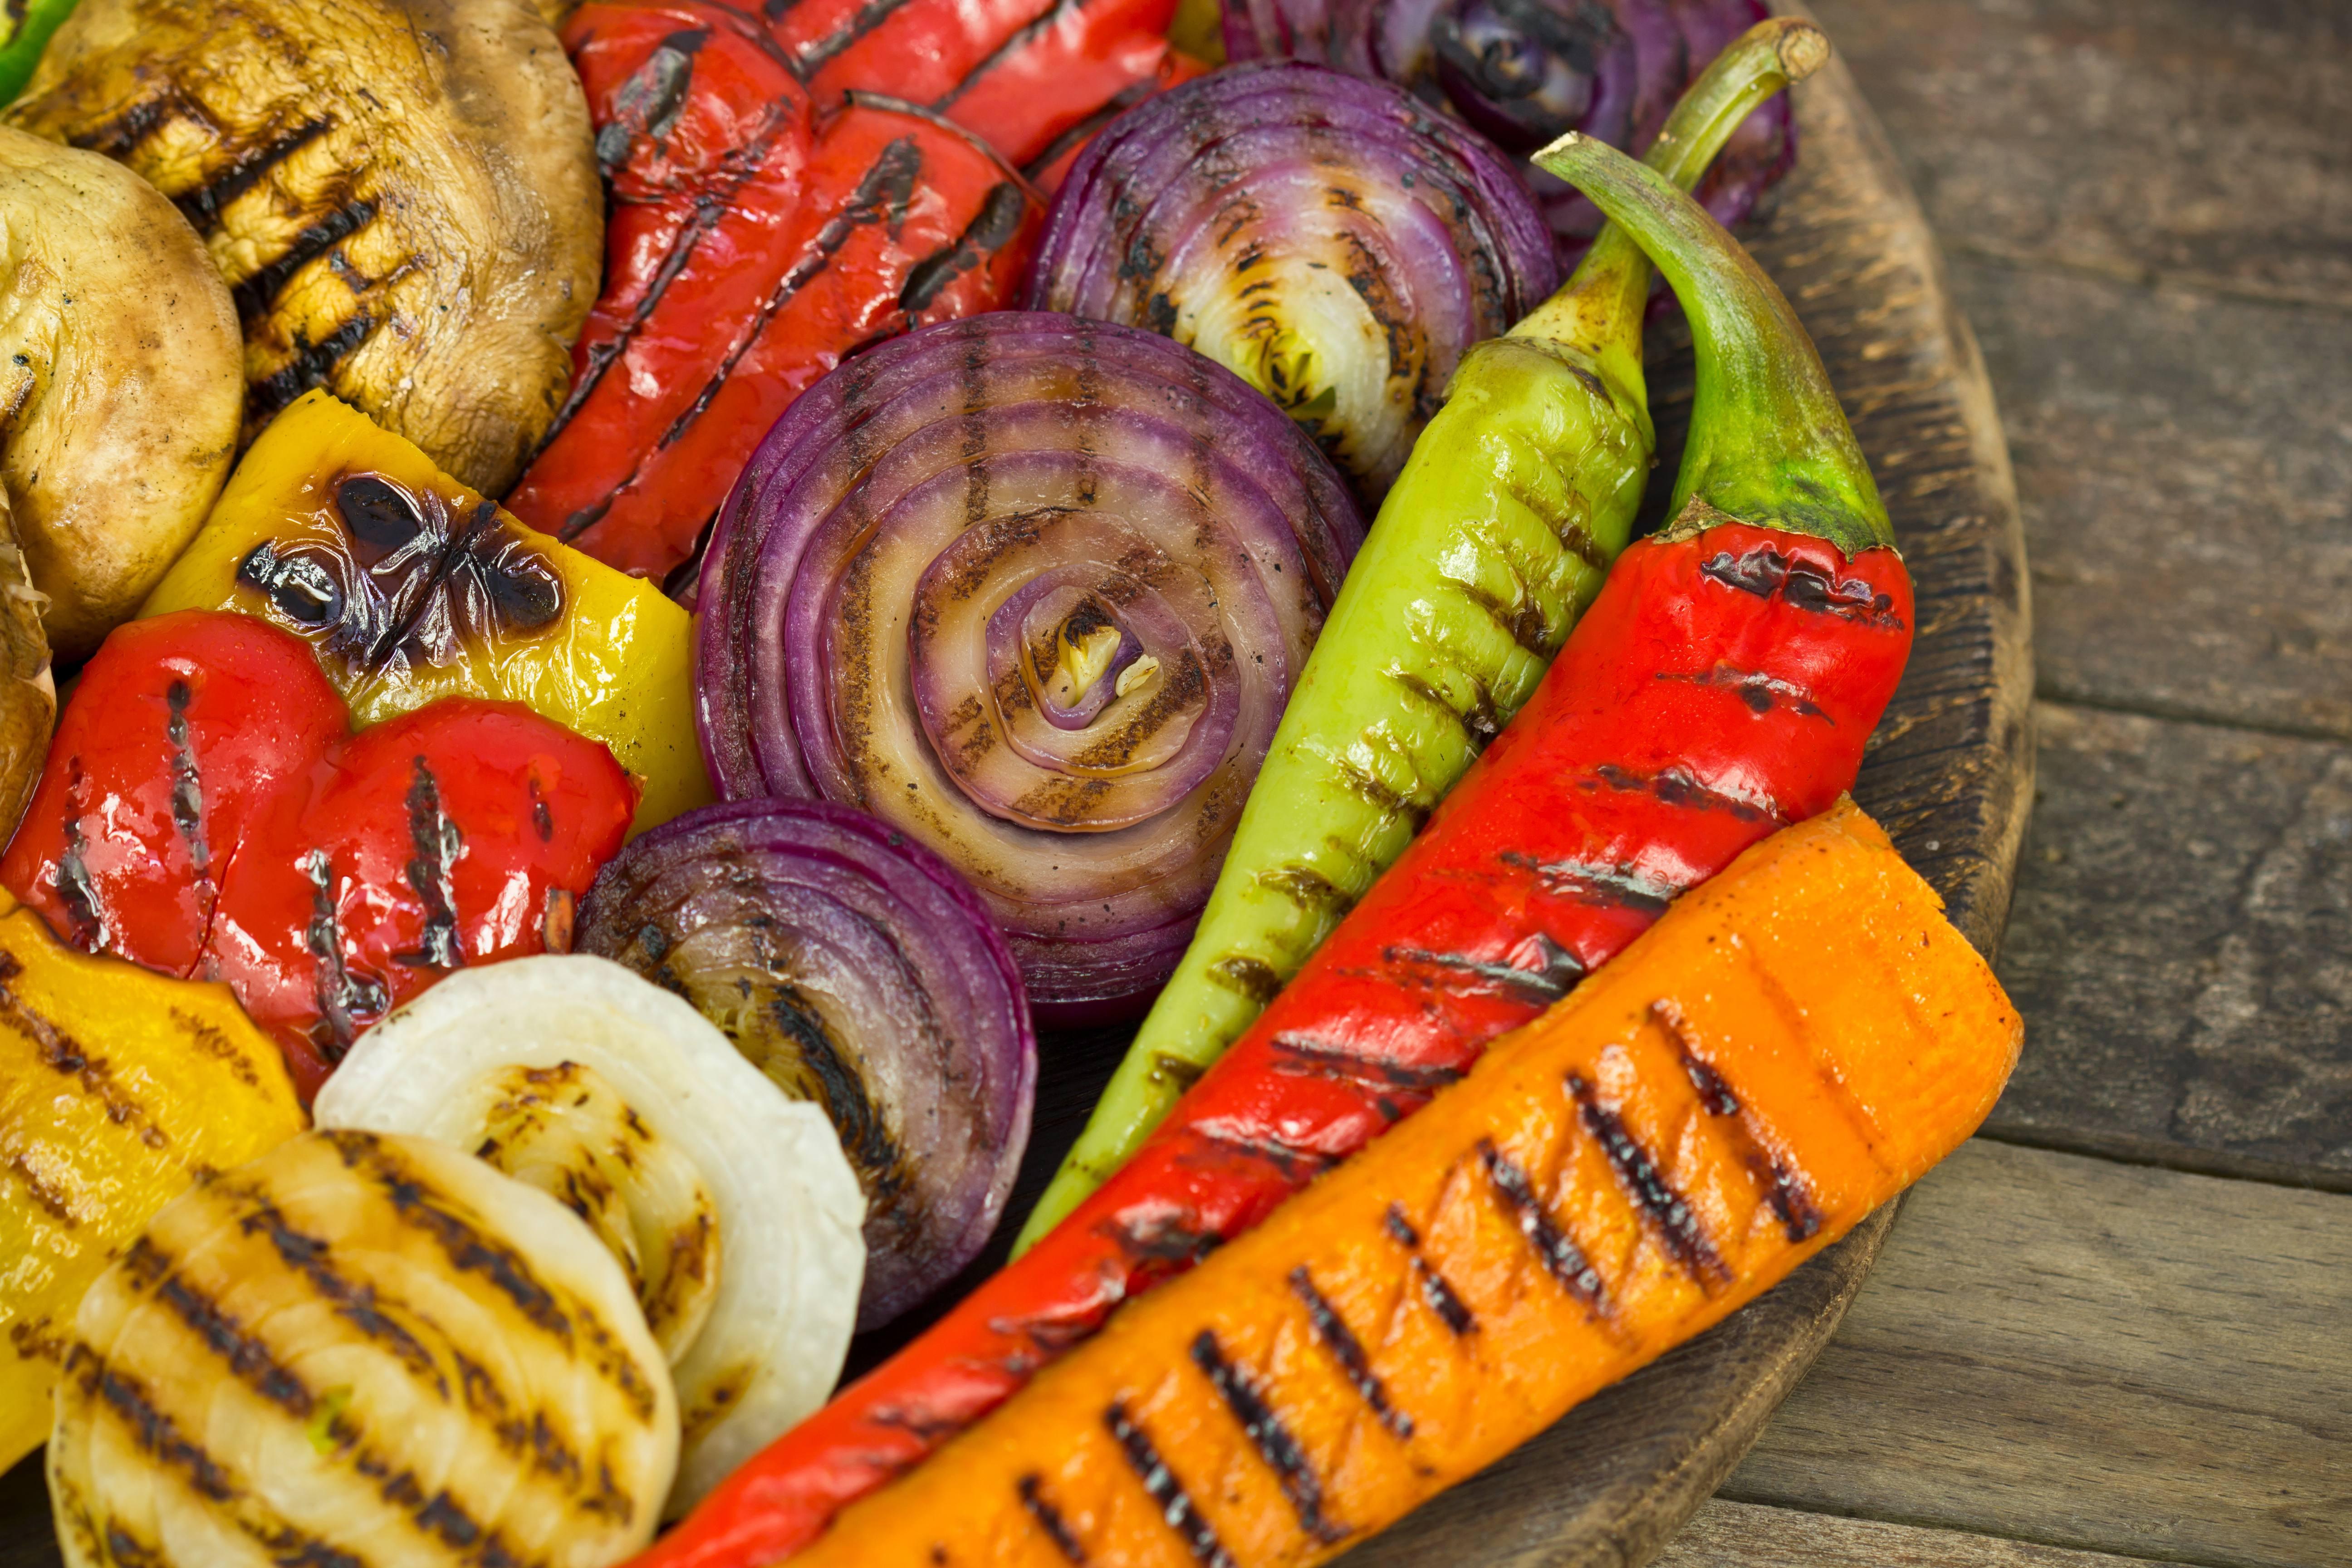 a wooden bowl of freshly roasted vegetables